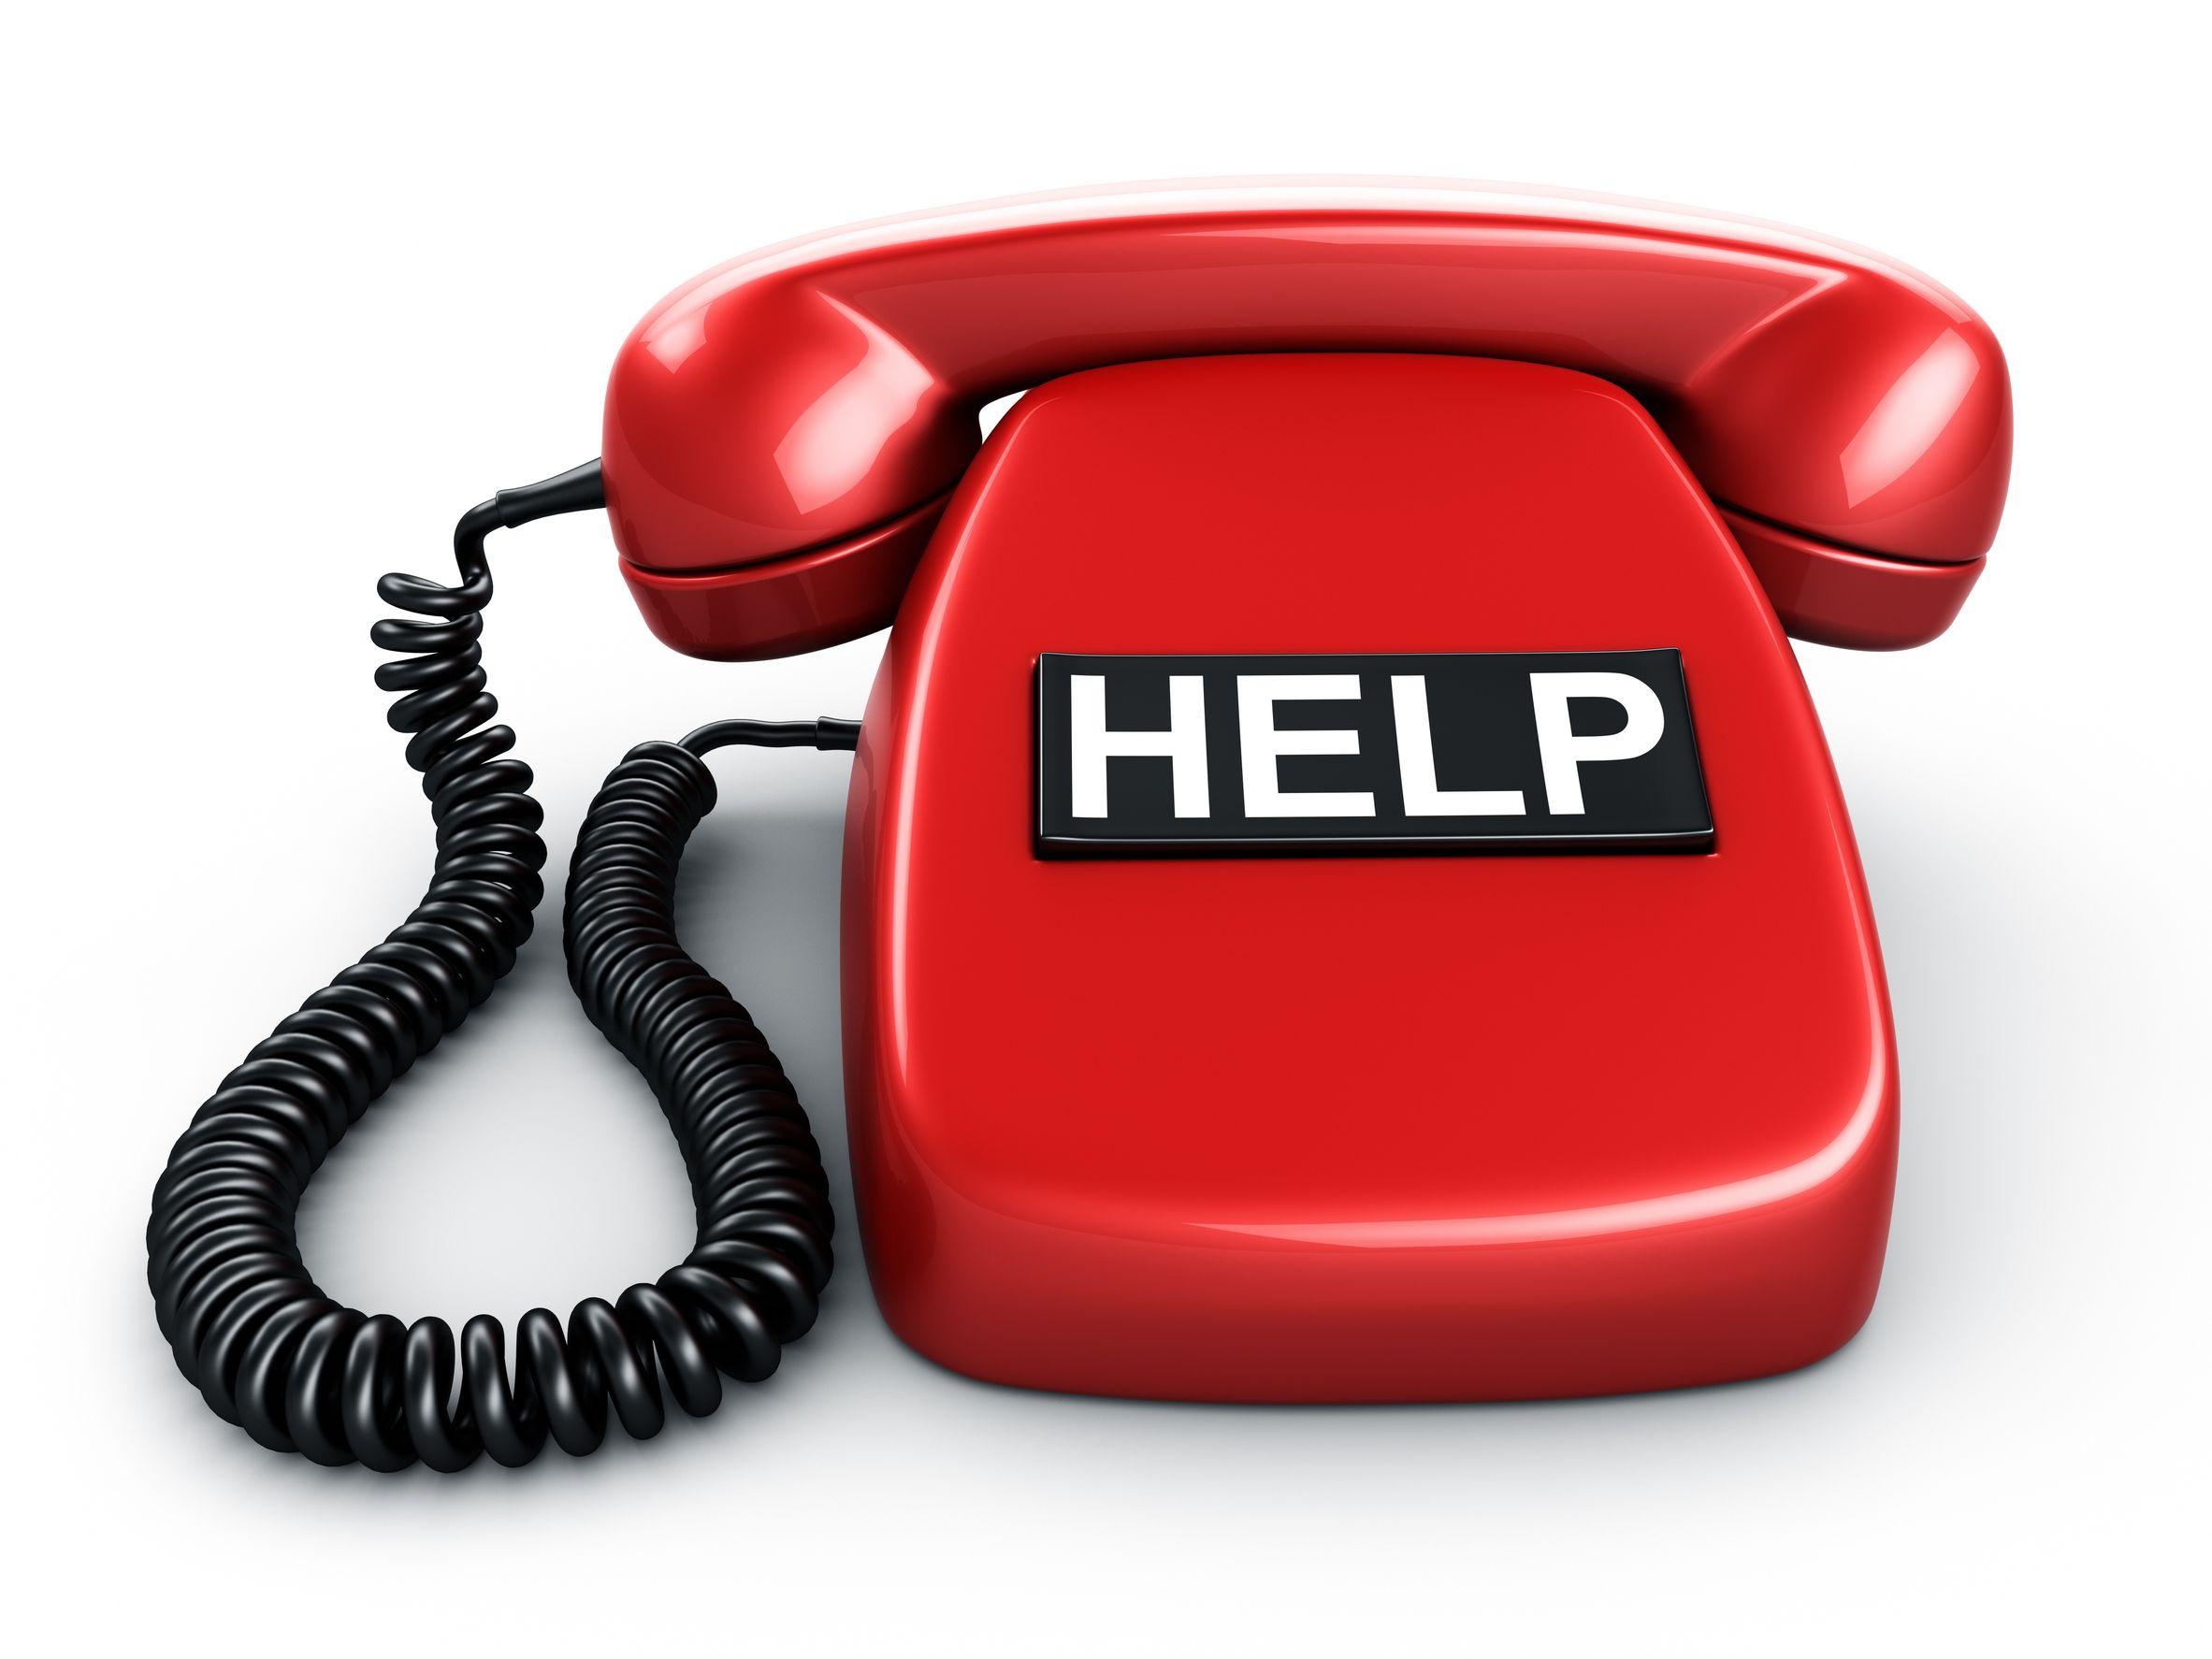 hotline for investors brings in uganda army 256 business news